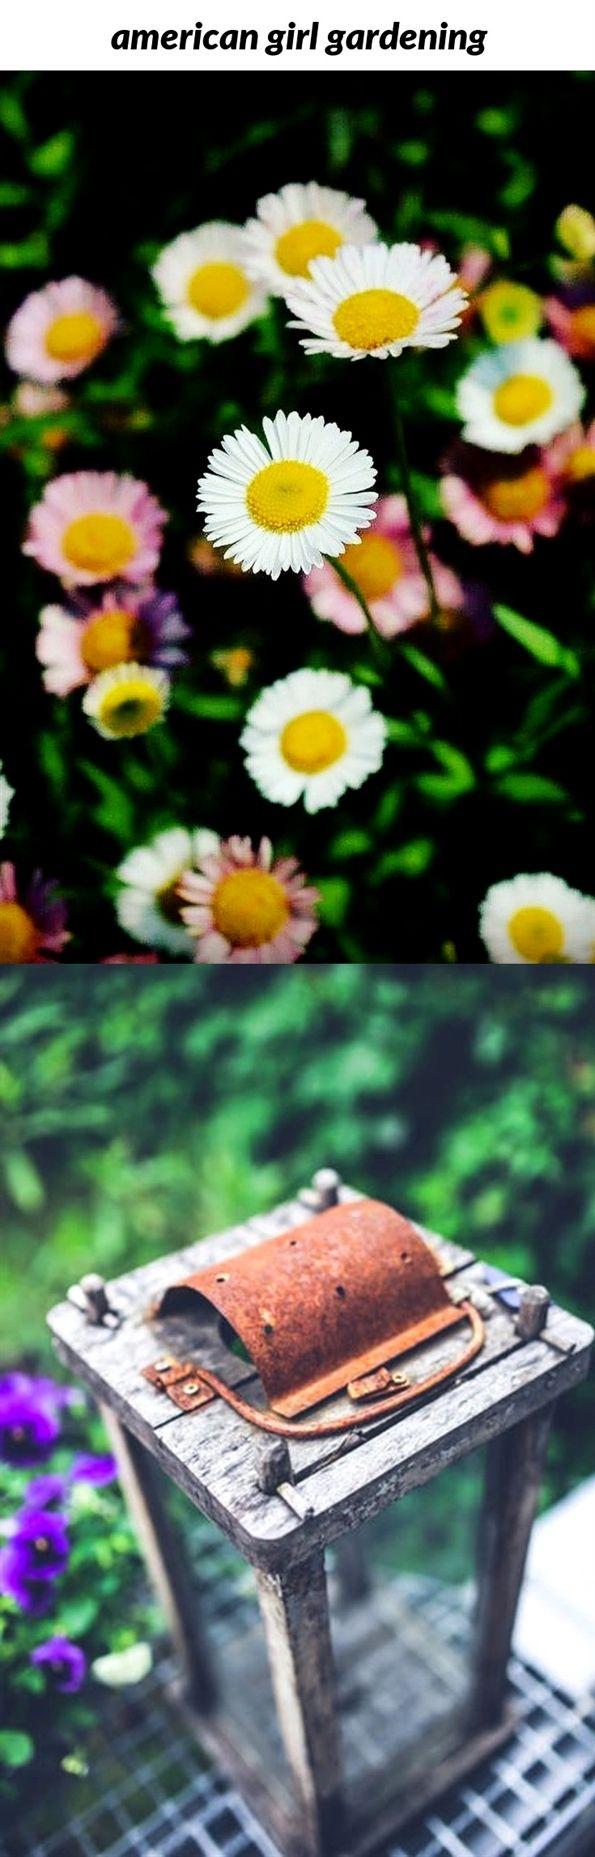 american girl gardening_83_20180822095840_53 garden